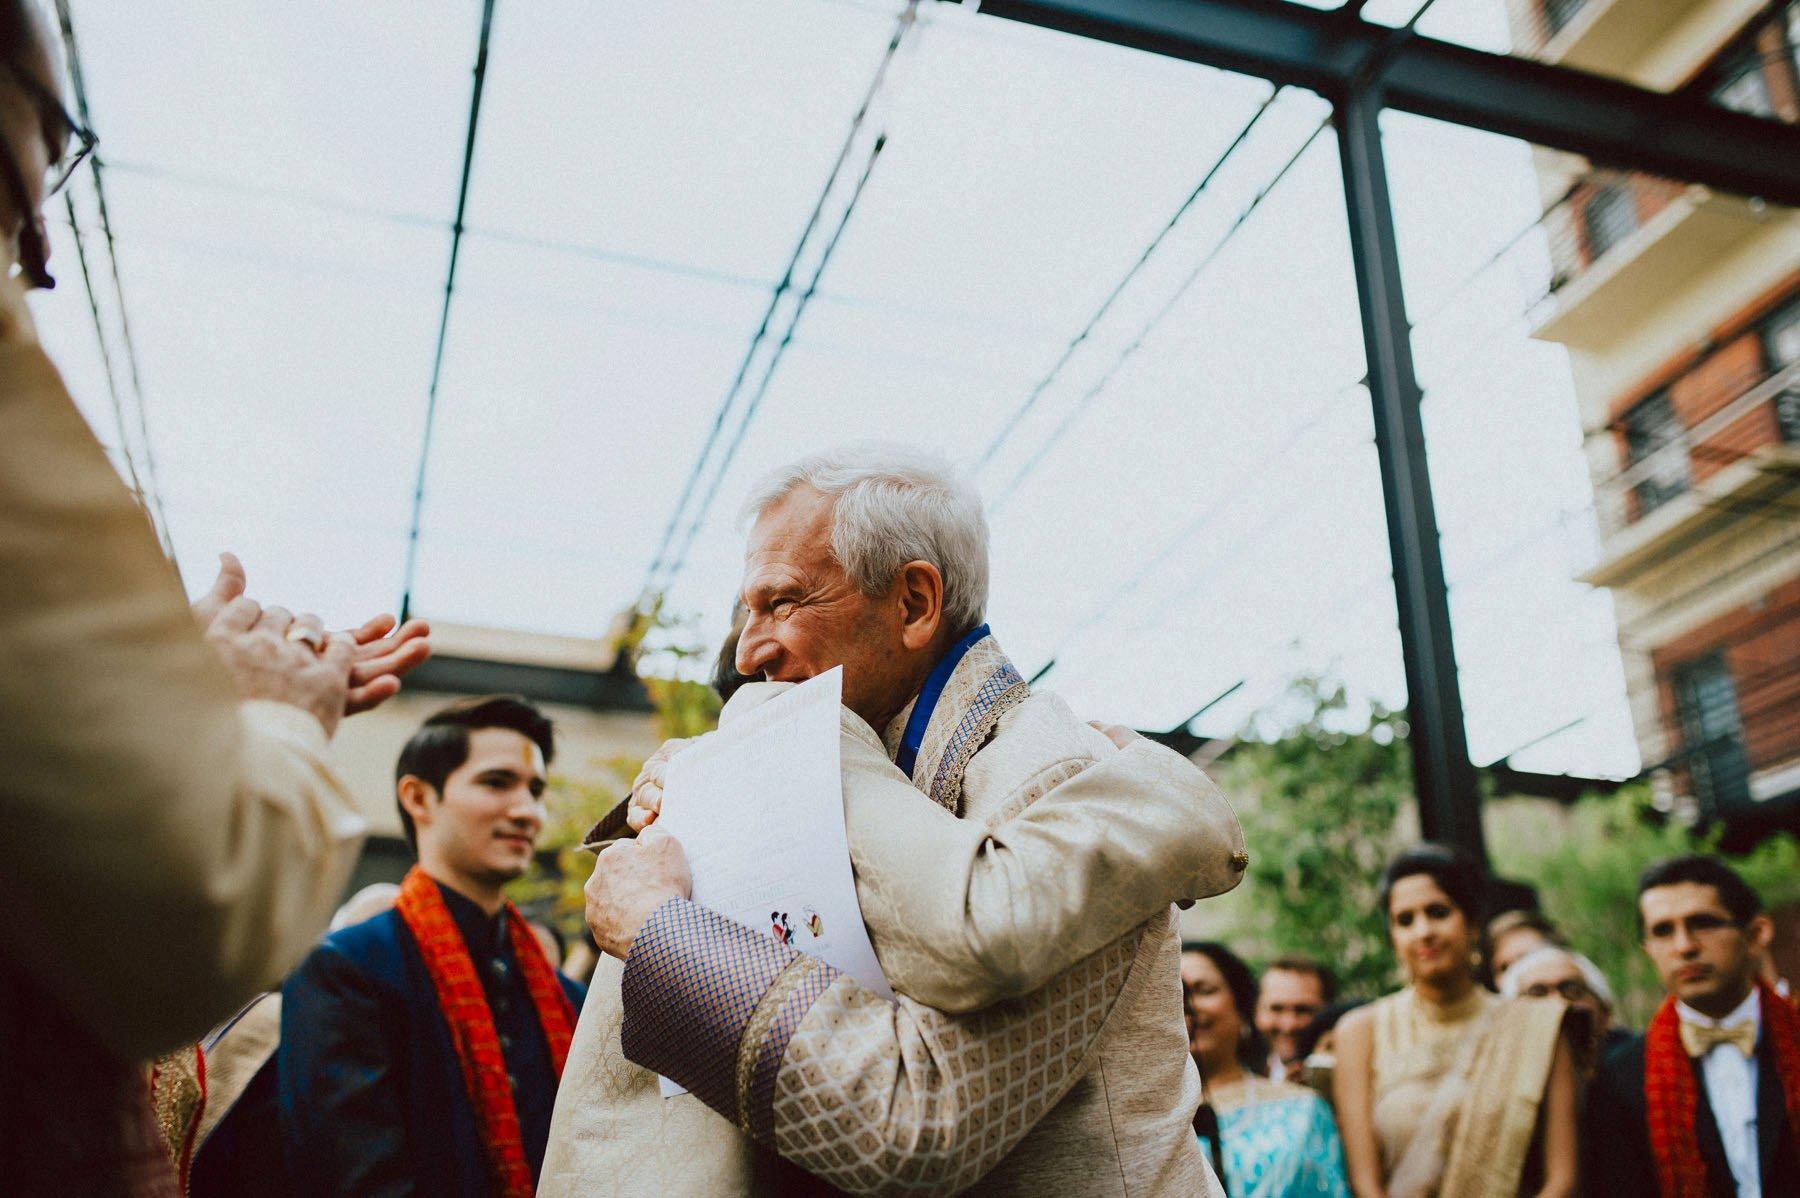 vie-philadelphia-indian-wedding-65.jpg